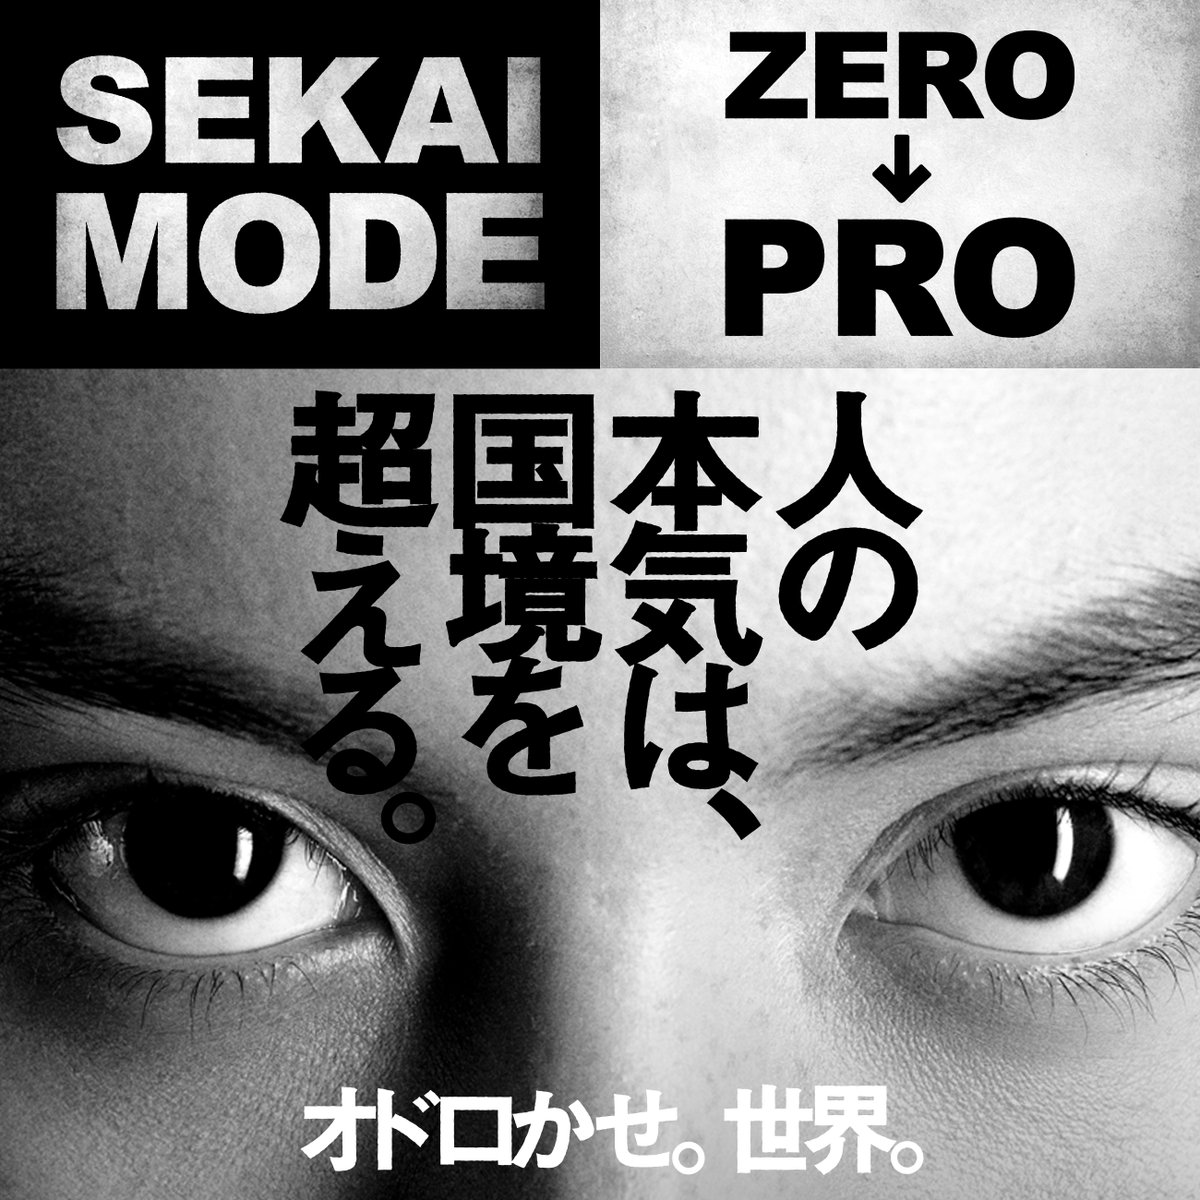 Cm 学園 大阪 モード